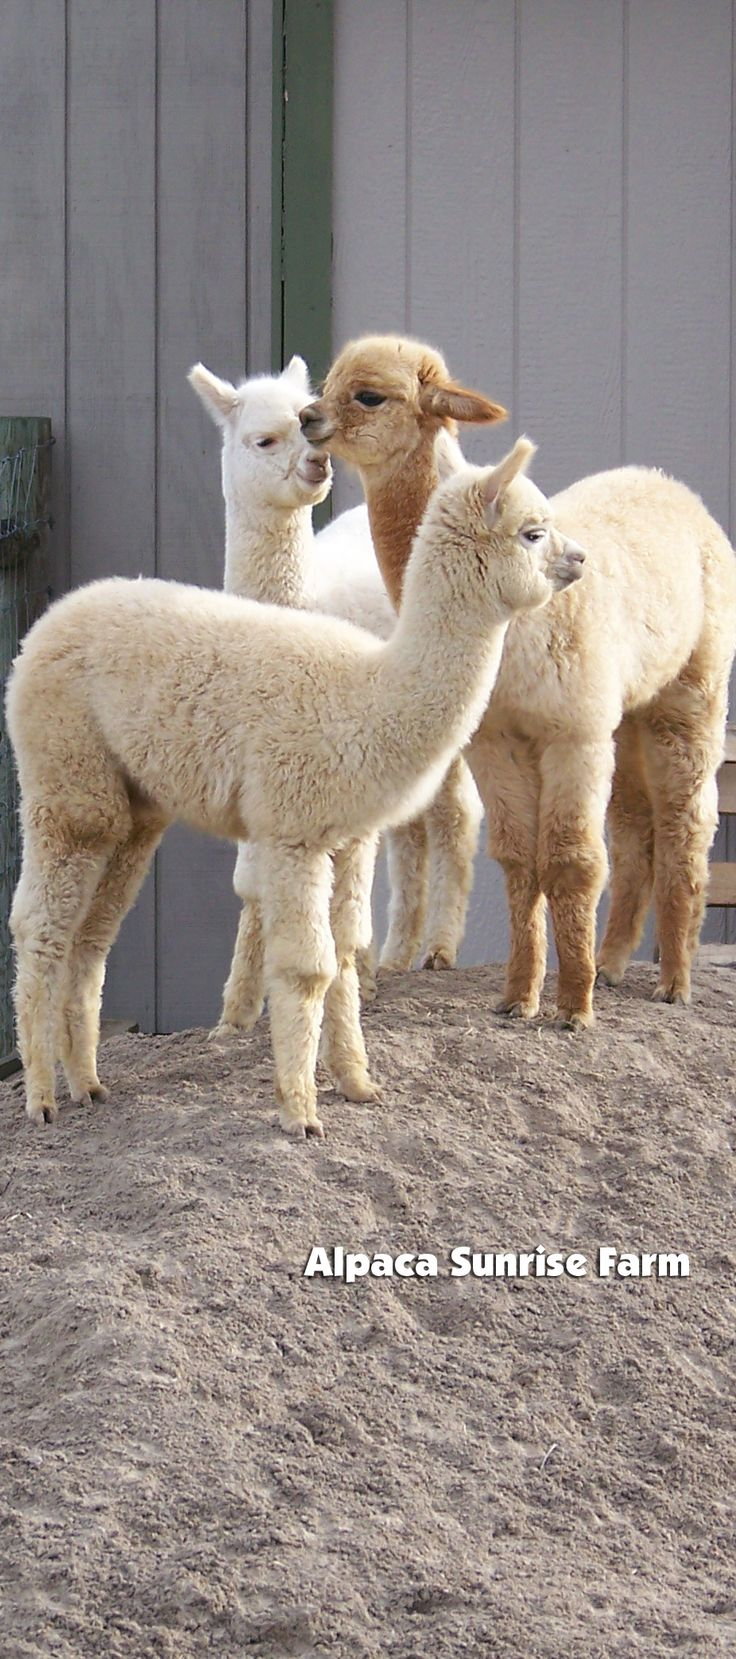 ALPACA CRIA. Alpaca Sunrise Farm is a full-service Alpaca farm since 1998 • Alpaca sales • breeding • boarding • Alpaca raw fiber, yarn, roving sales for knitters, crocheters, weavers and fiber artists. www.AlpacaSunrise... #alpaca #alpacas